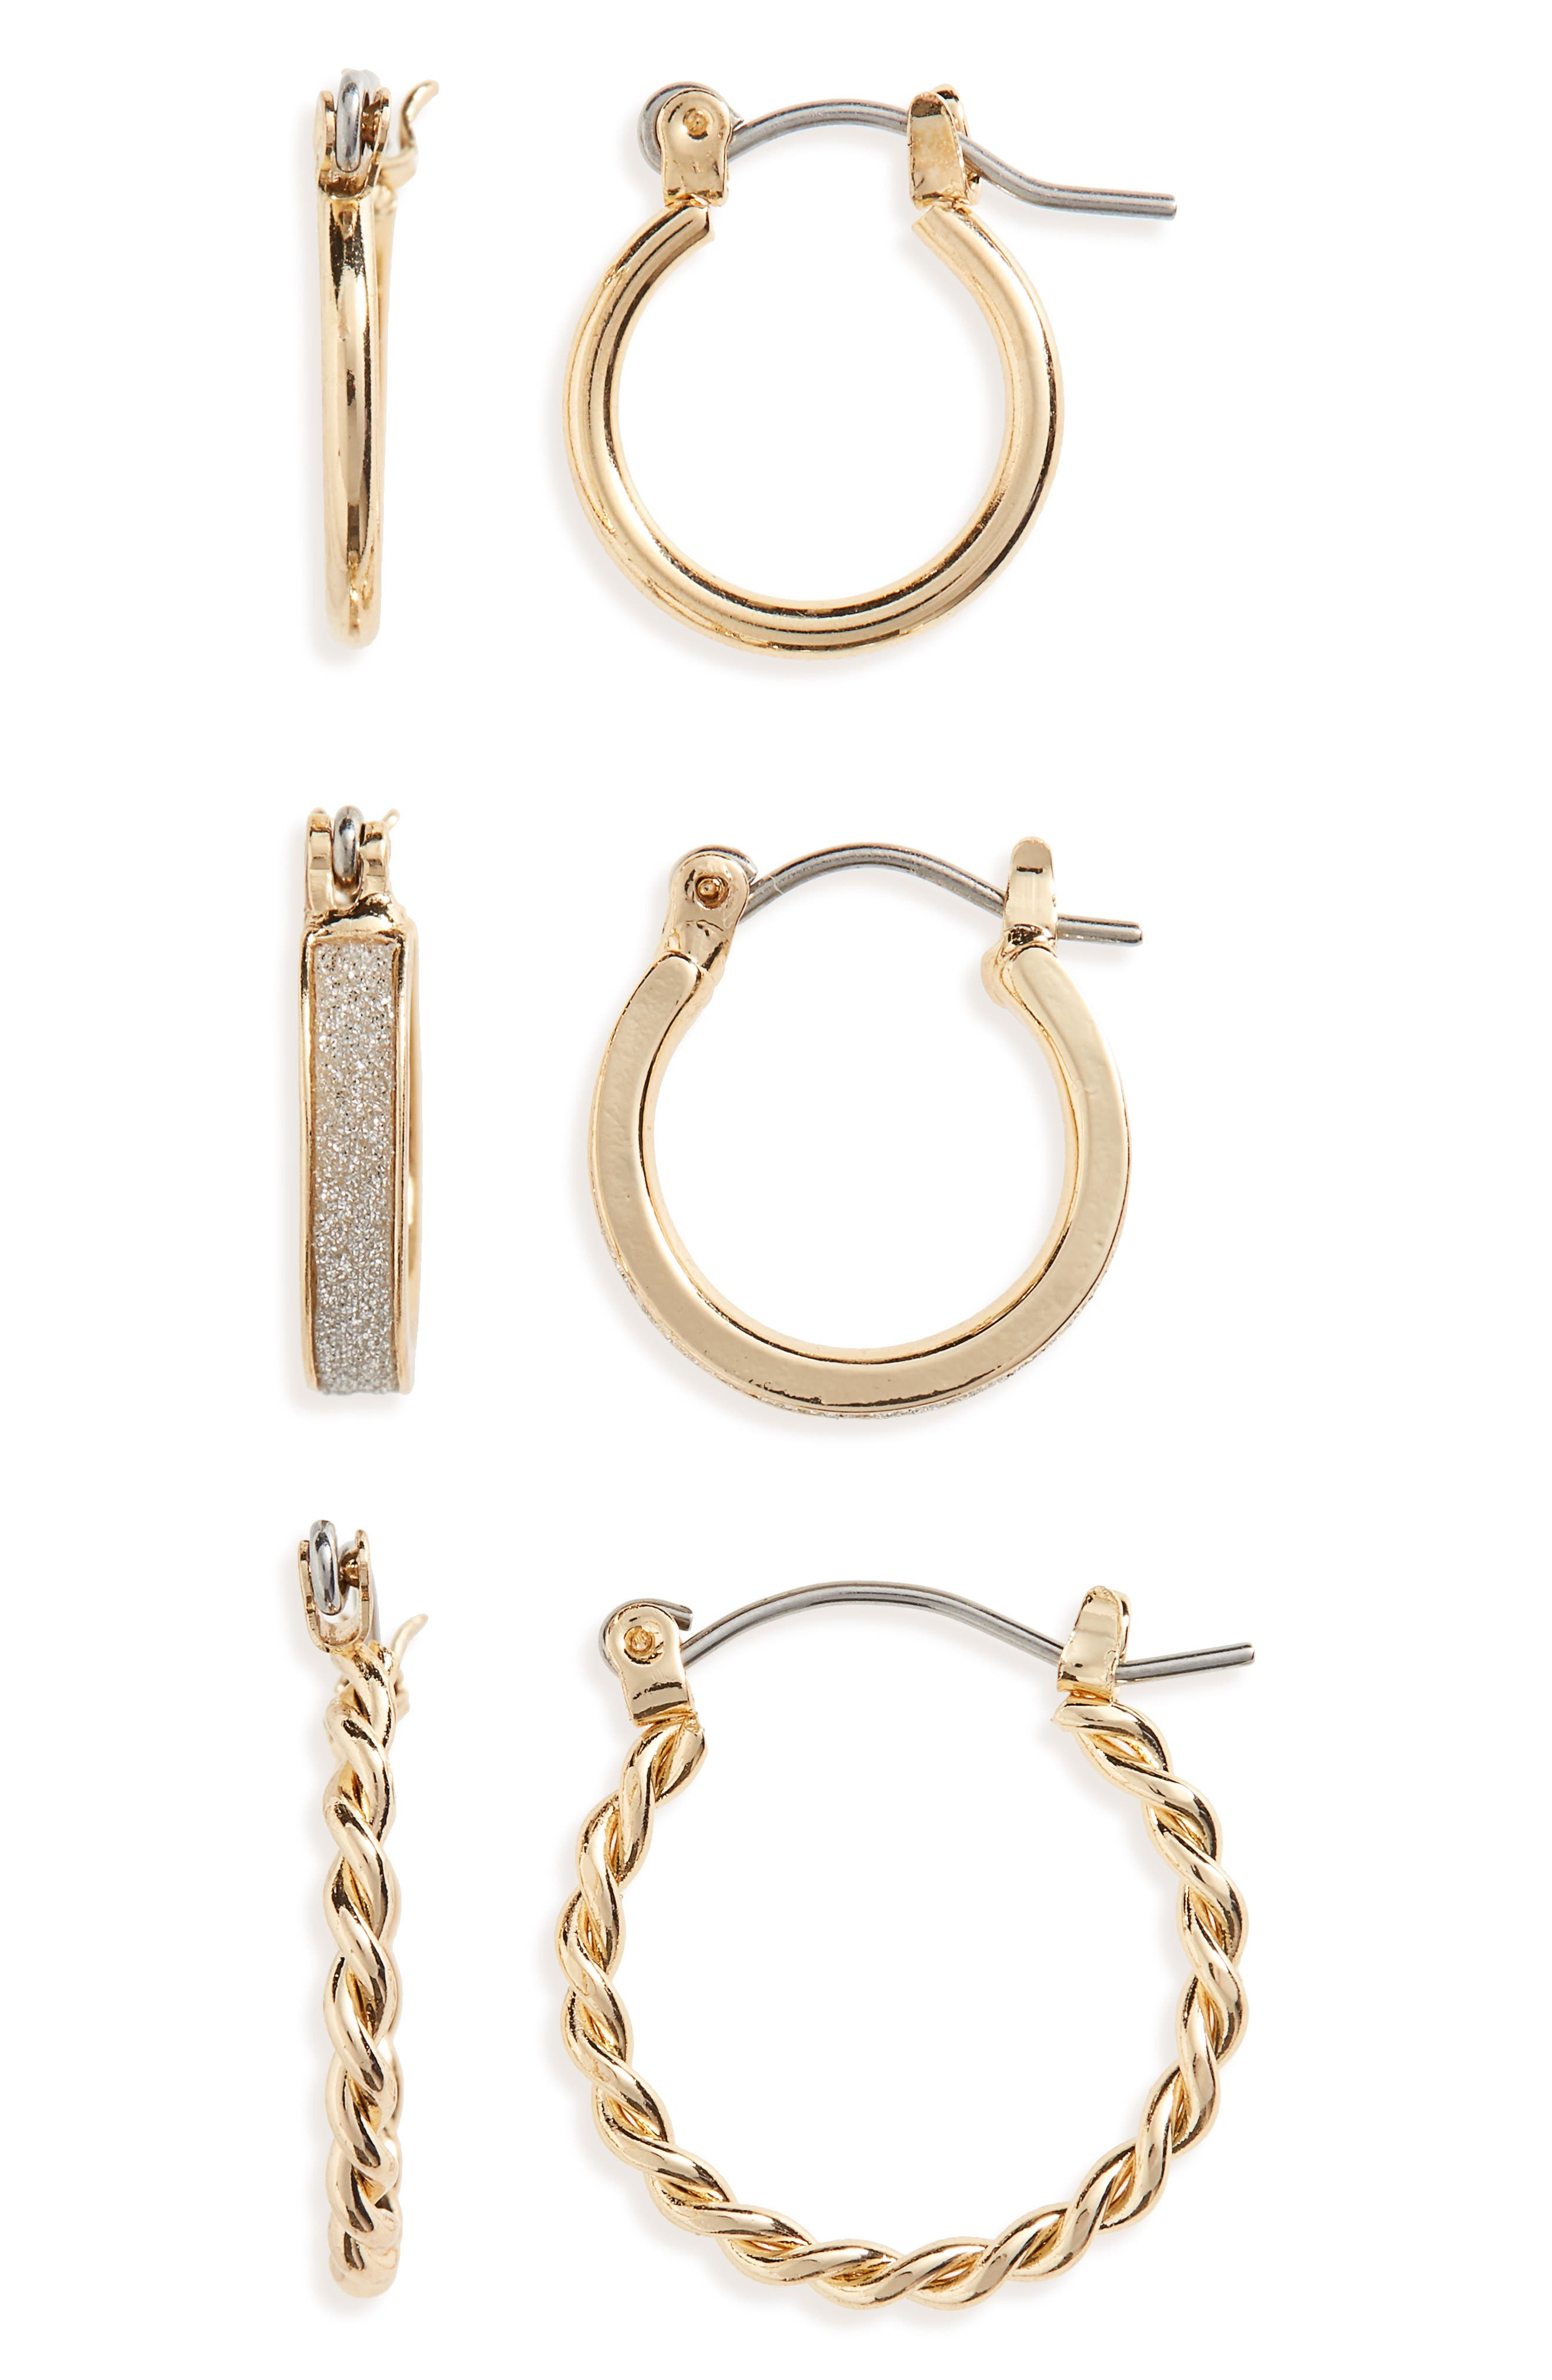 3-Pack Small Hoop Earrings,                             Main thumbnail 1, color,                             710